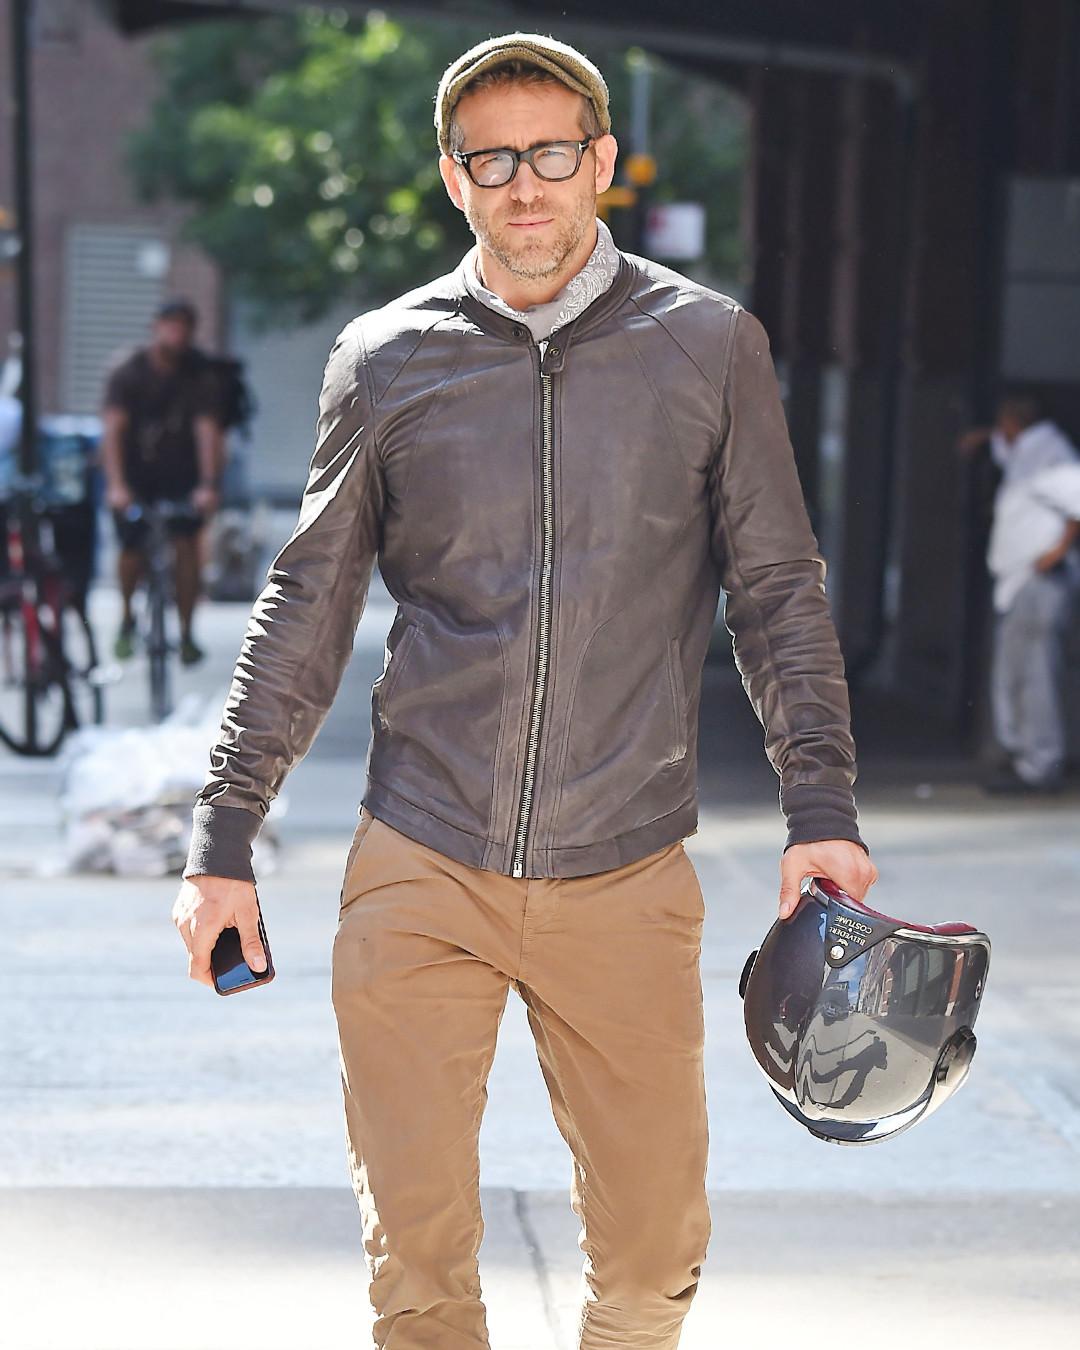 ESC: Ryan Reynolds